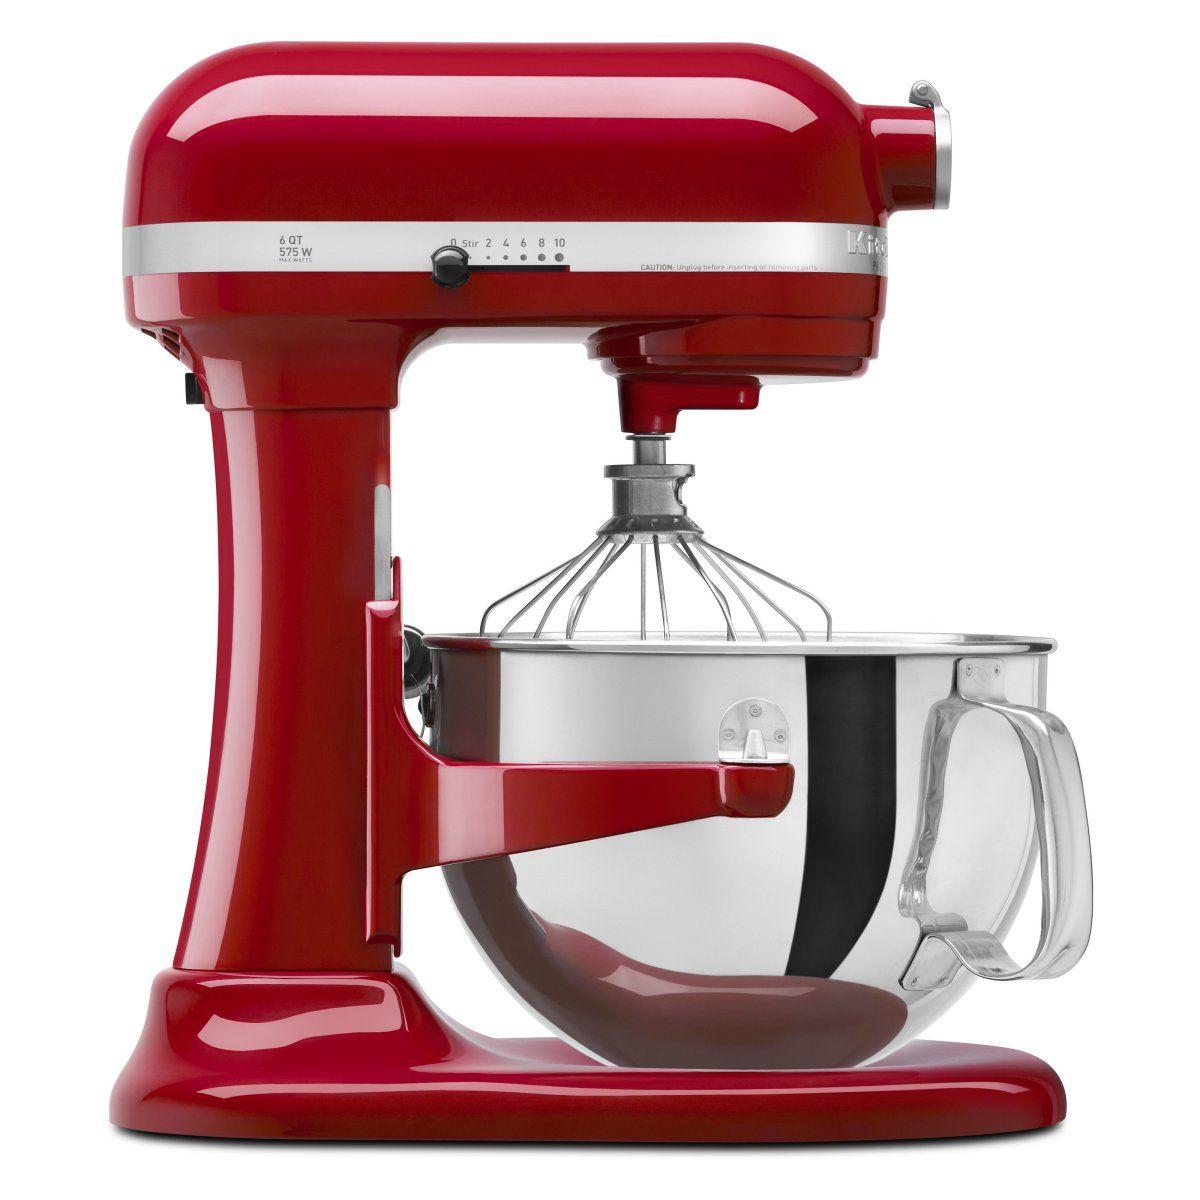 Kitchenaid kp26m1xer professional 600 series stand mixer